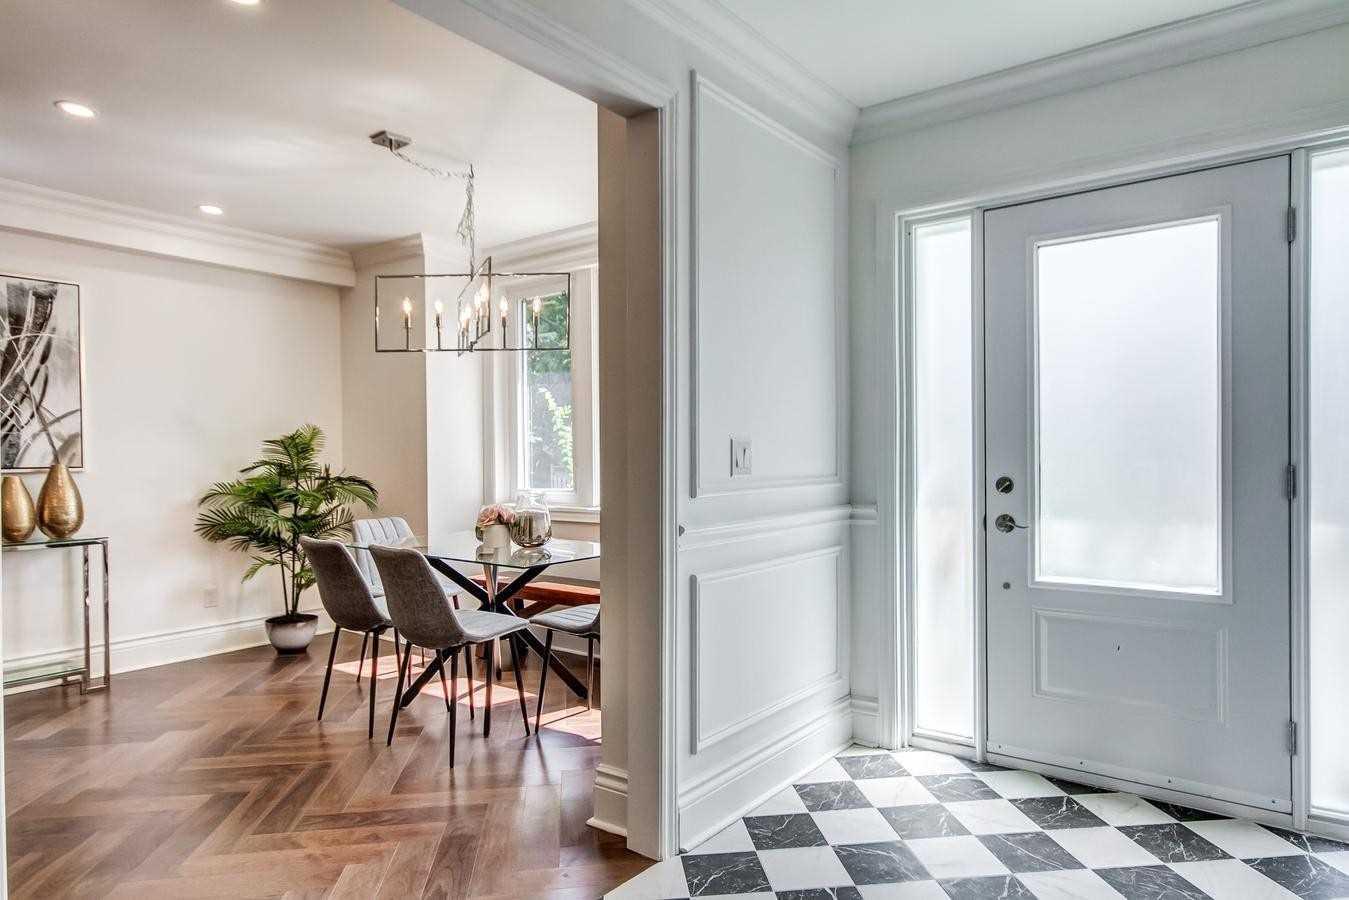 48 Weatherell St, Toronto, Ontario M6S1T1, 4 Bedrooms Bedrooms, 9 Rooms Rooms,4 BathroomsBathrooms,Detached,For Sale,Weatherell,W5364220